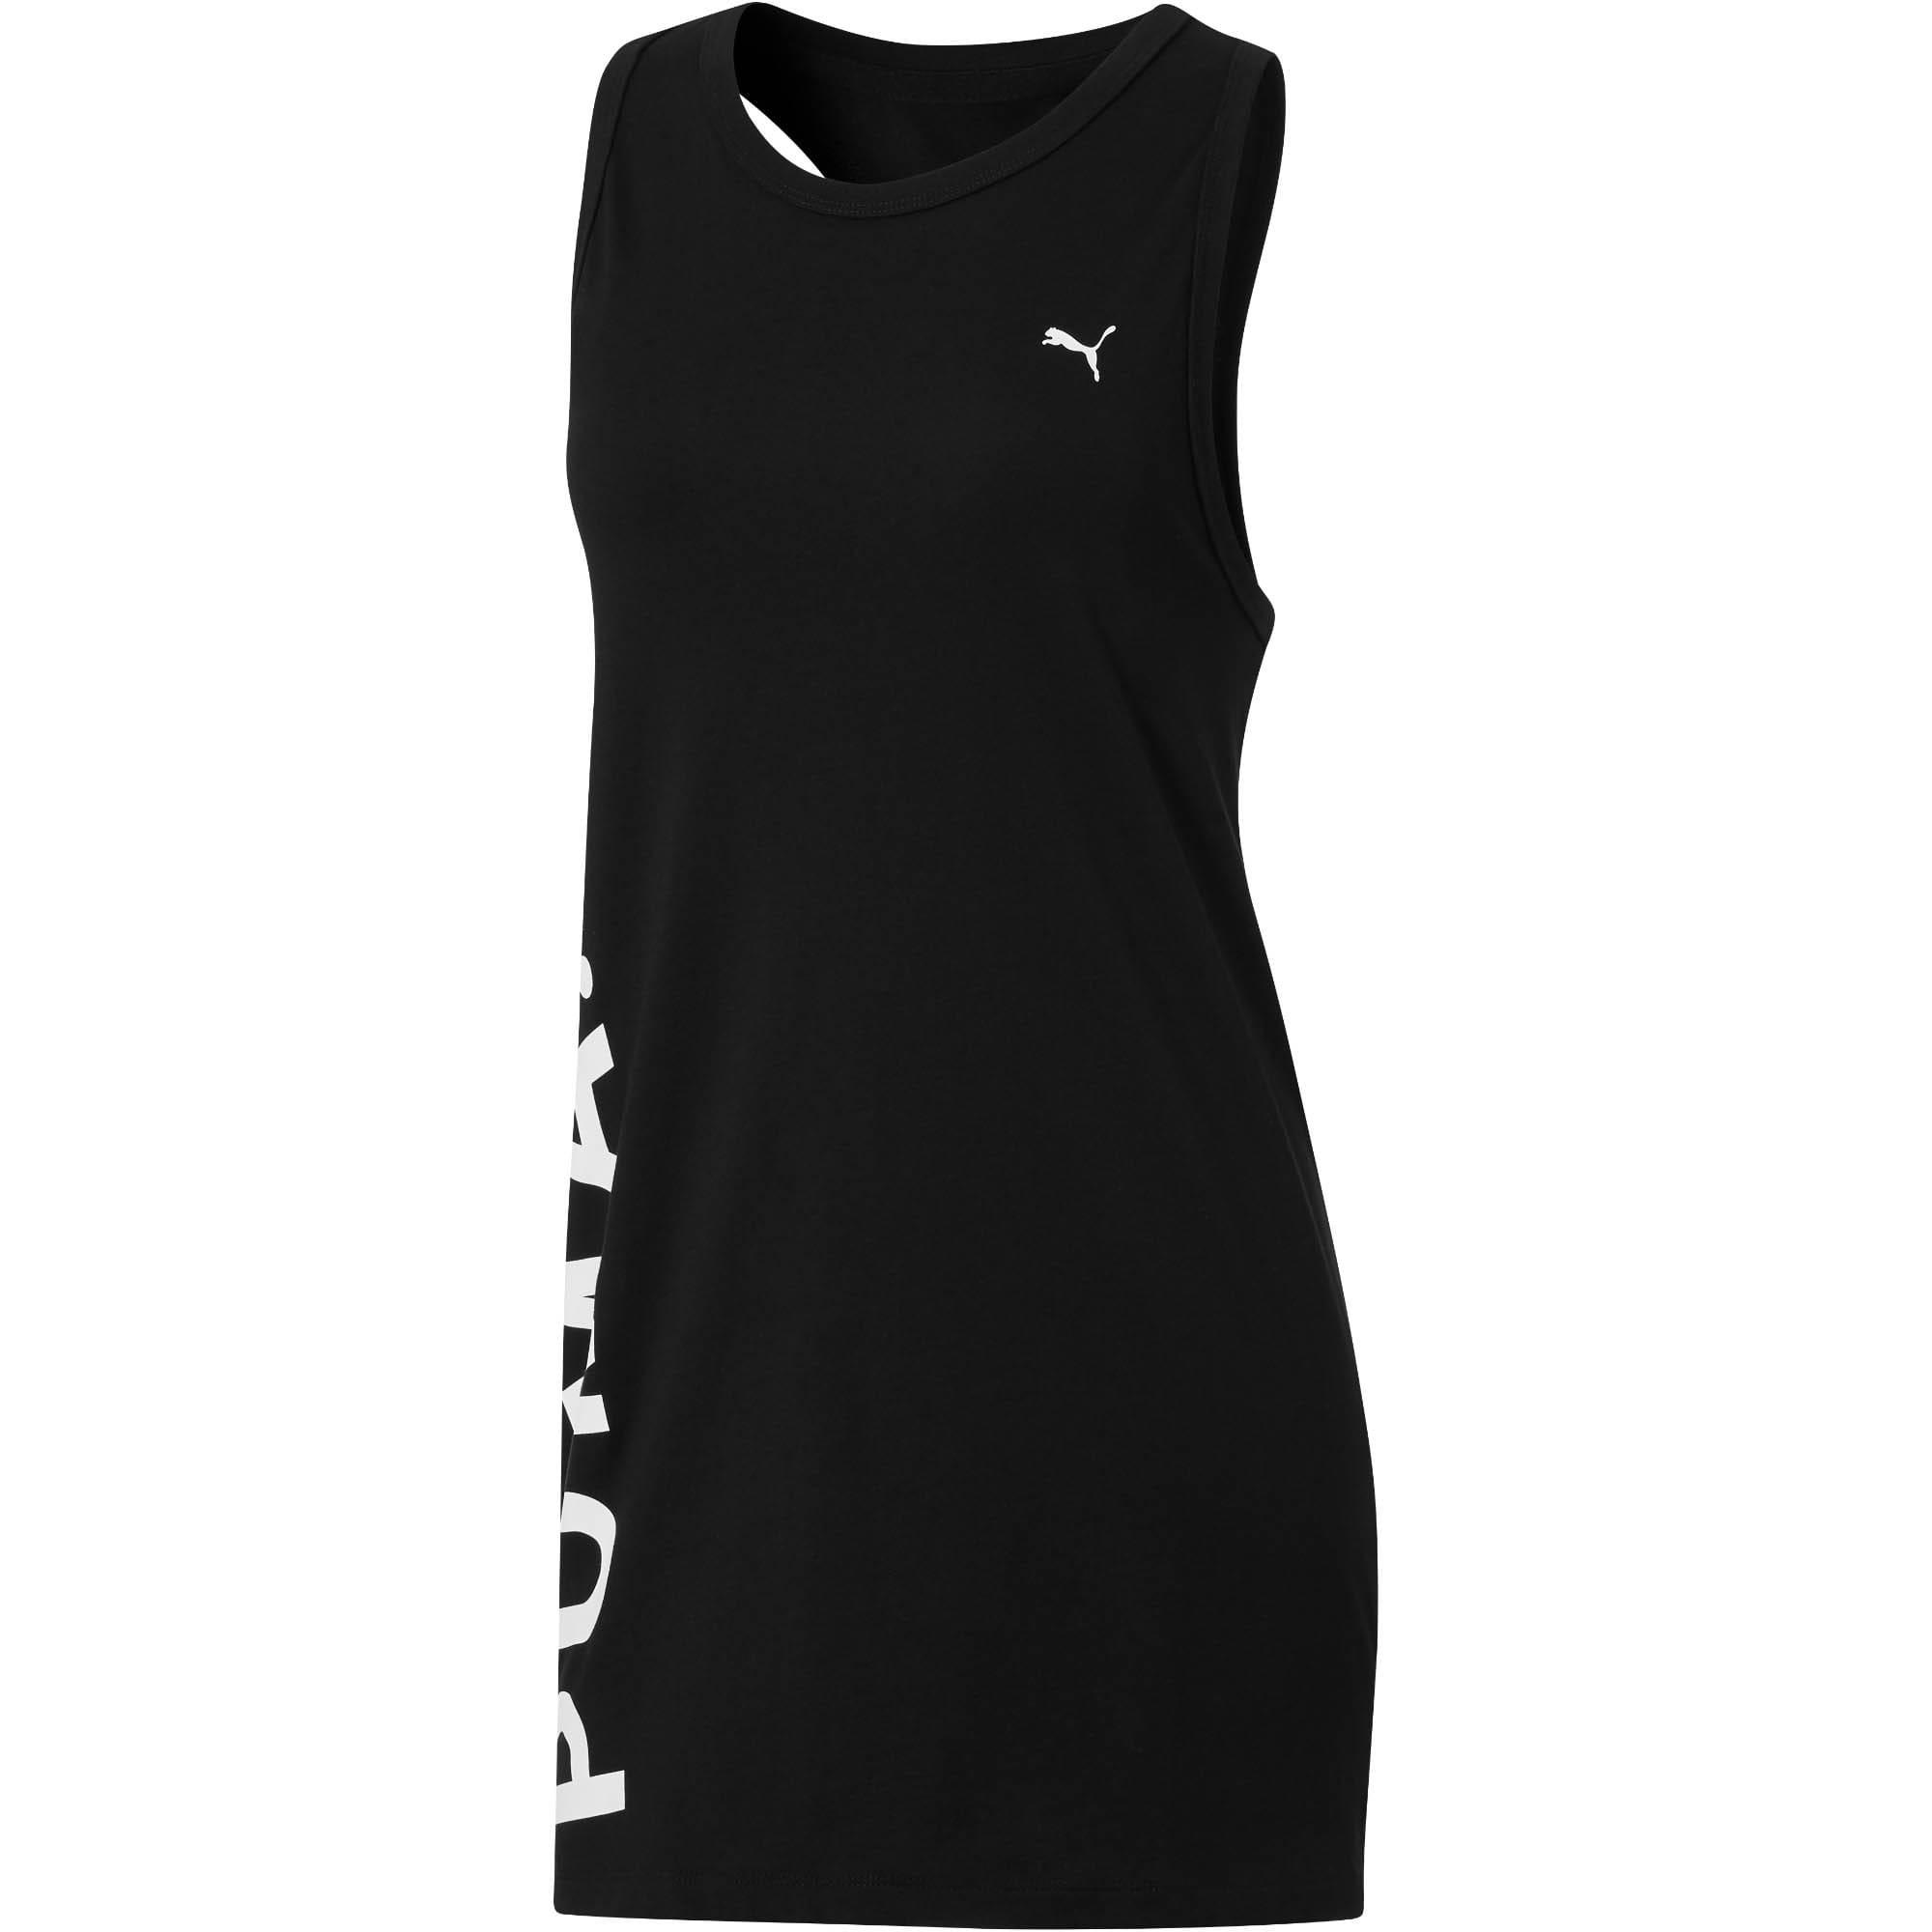 Miniatura 1 de Camiseta sin mangas Chase de mujer, Cotton Black, mediano